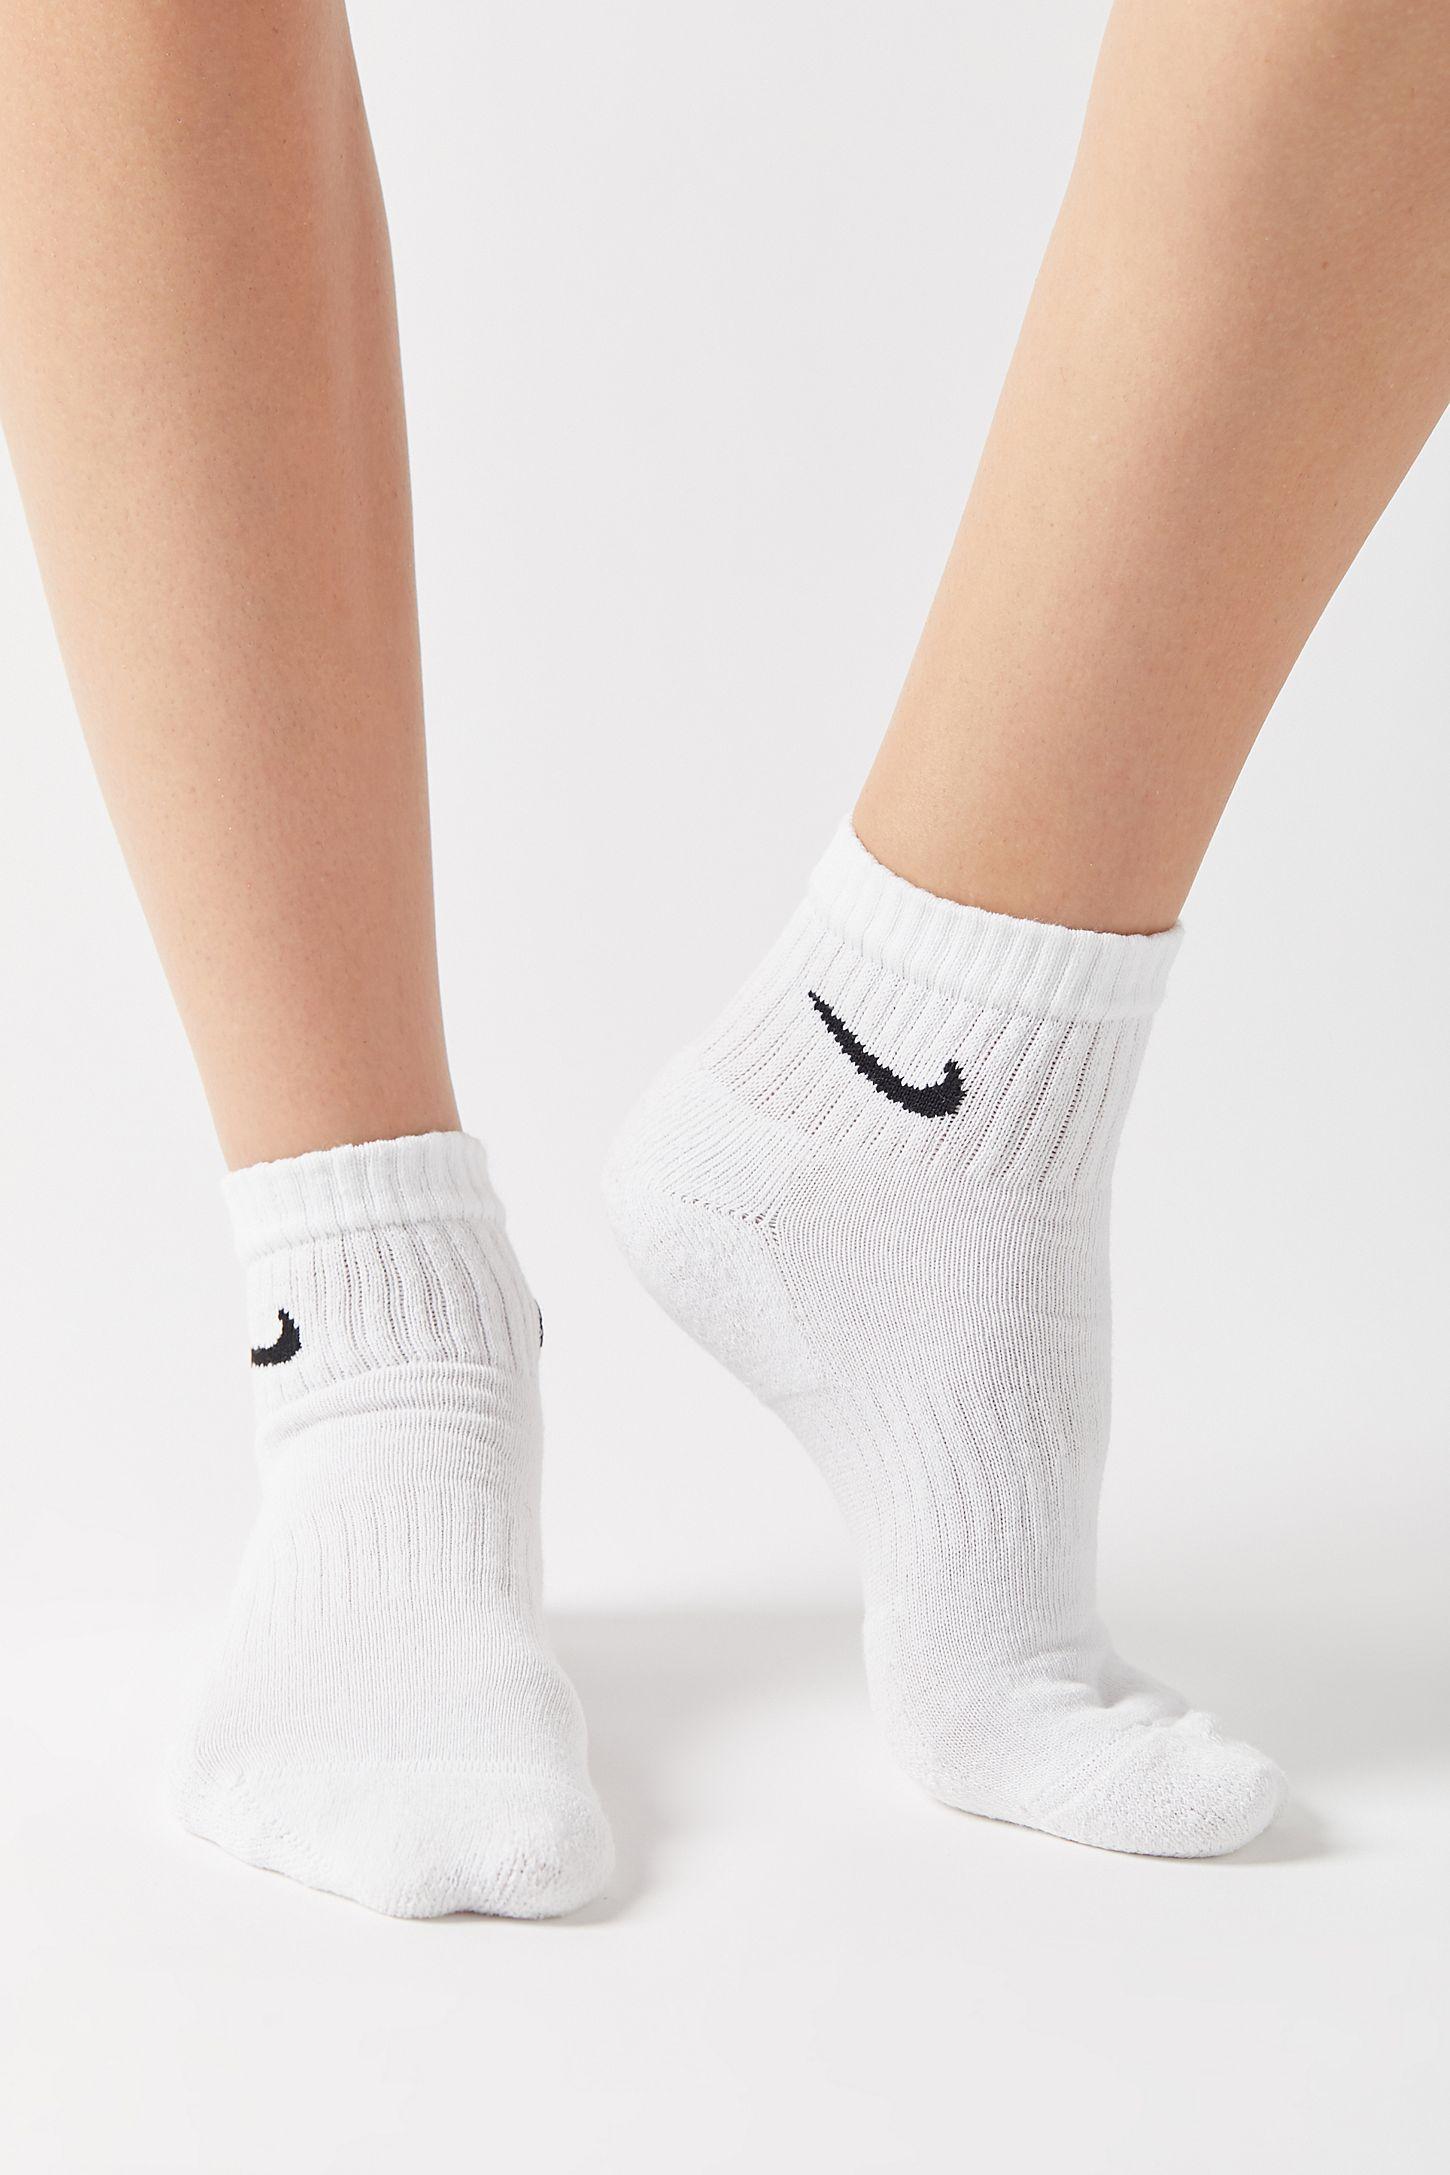 Nike Everyday Cushion Quarter Sock 6 Pack In 2020 Nike Socks Outfit White Nike Socks Nike Socks Women